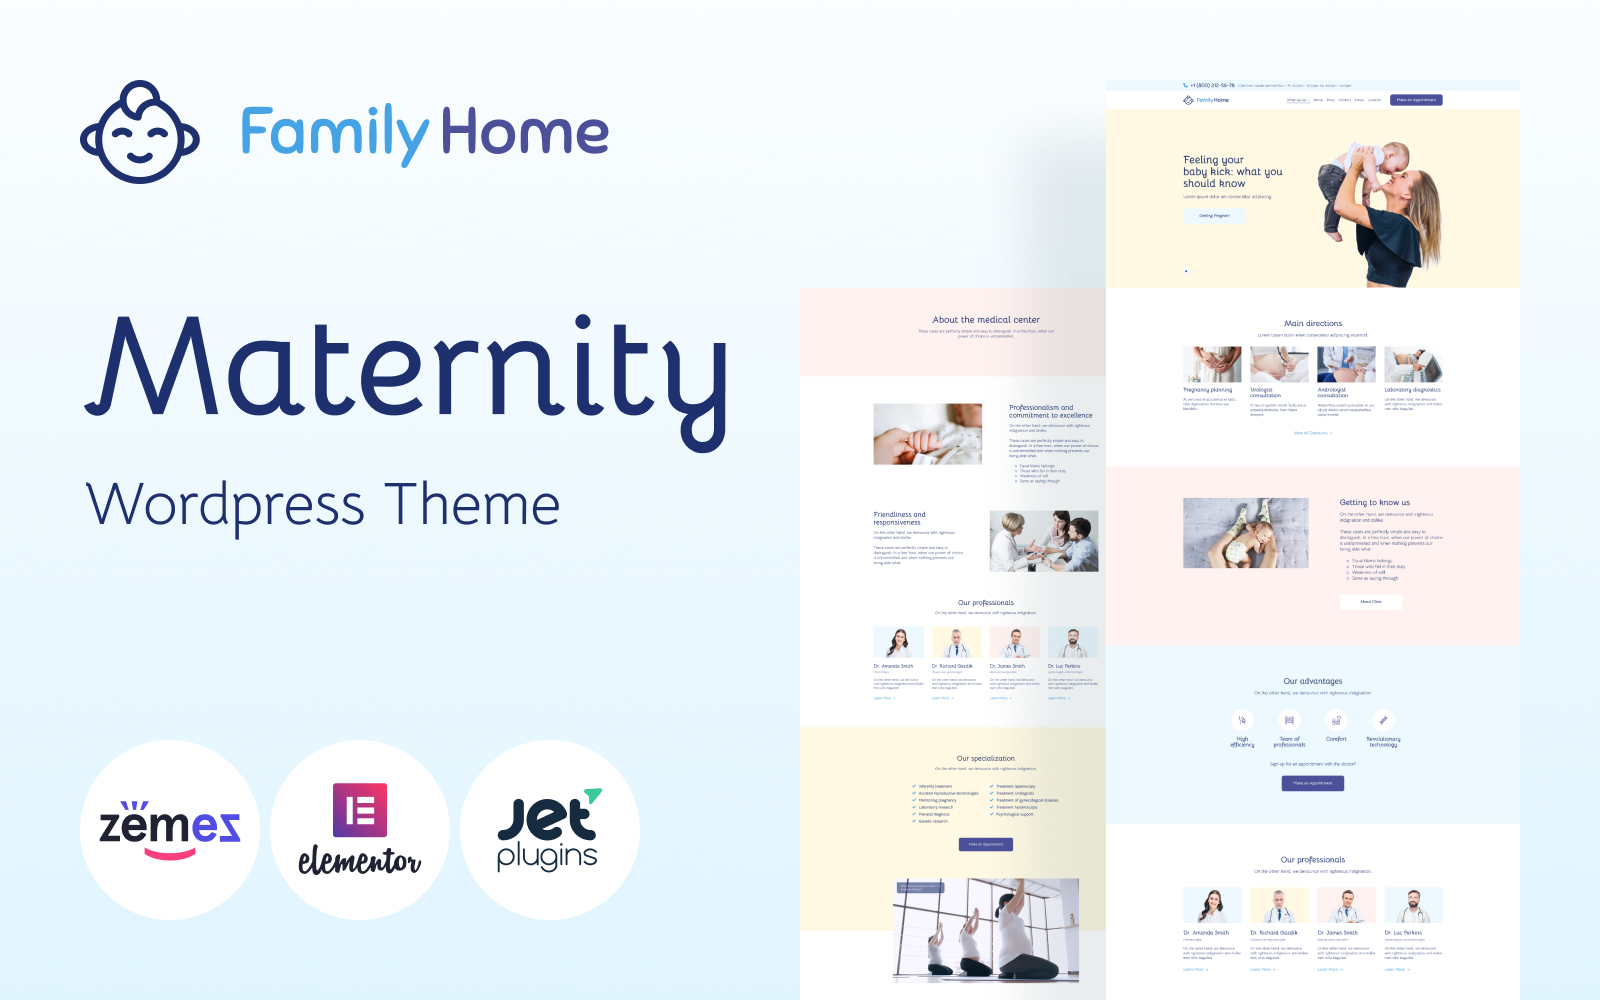 FamilyHome - Pregnancy and Maternity WordPress Theme